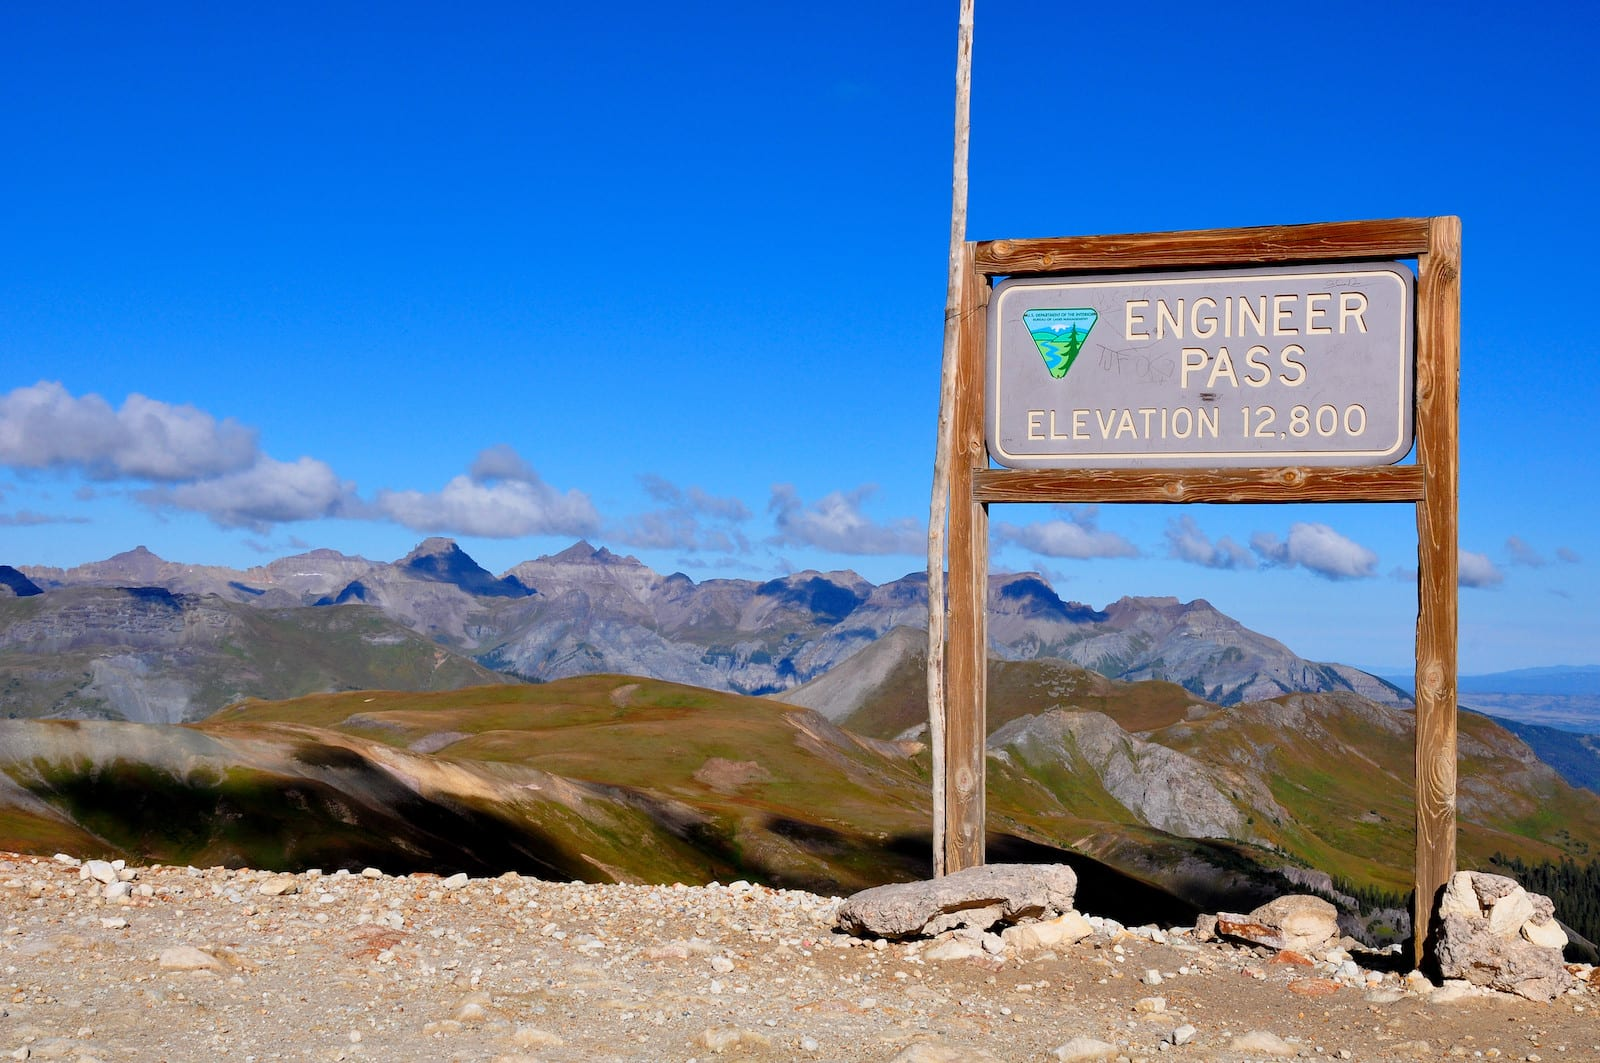 Engineer Pass sign, Colorado